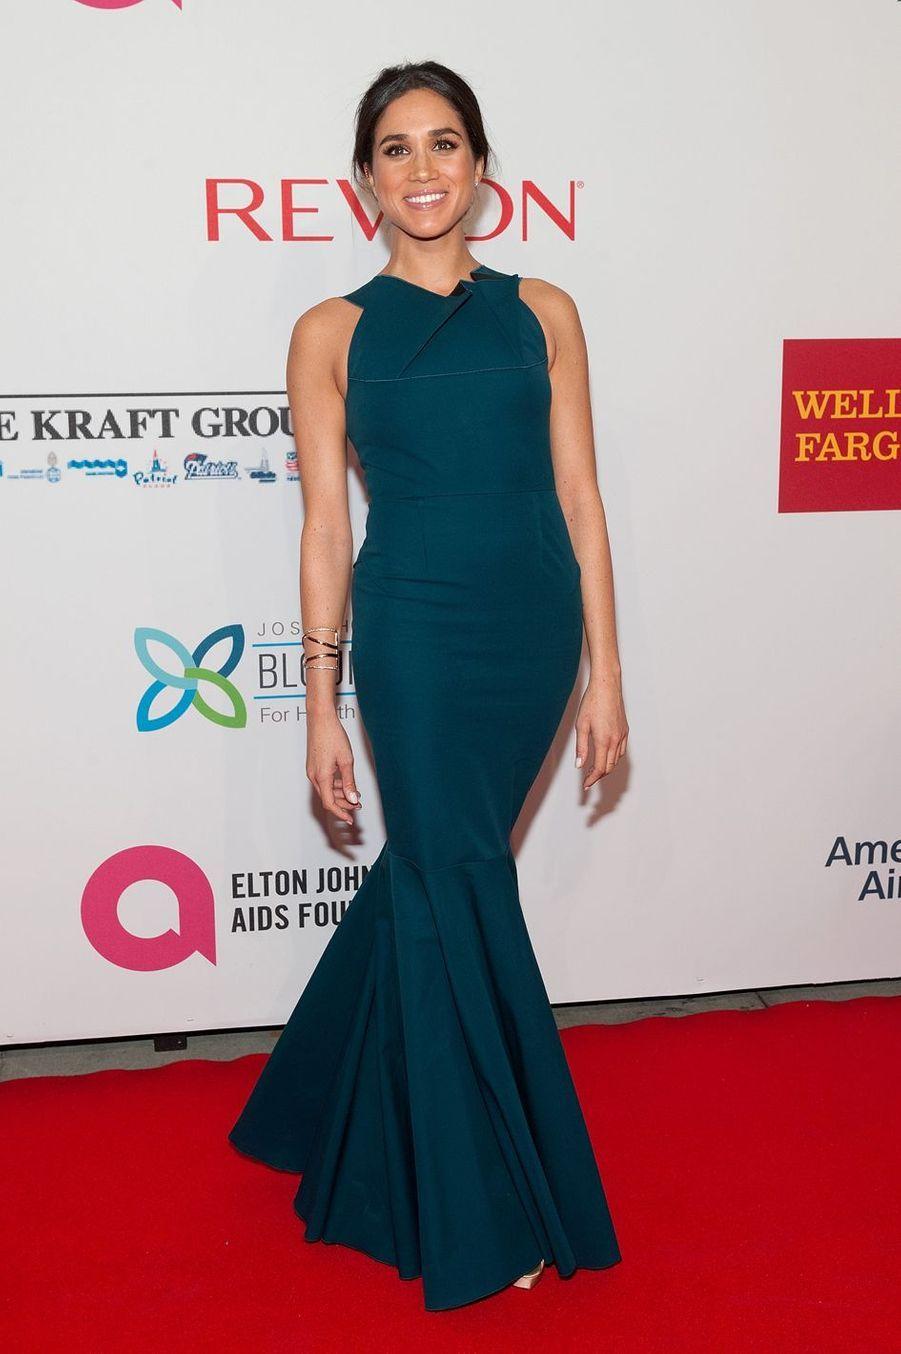 Meghan Markle au gala caritatif de la Elton John AIDS Foundation à New York en octobre 2014.